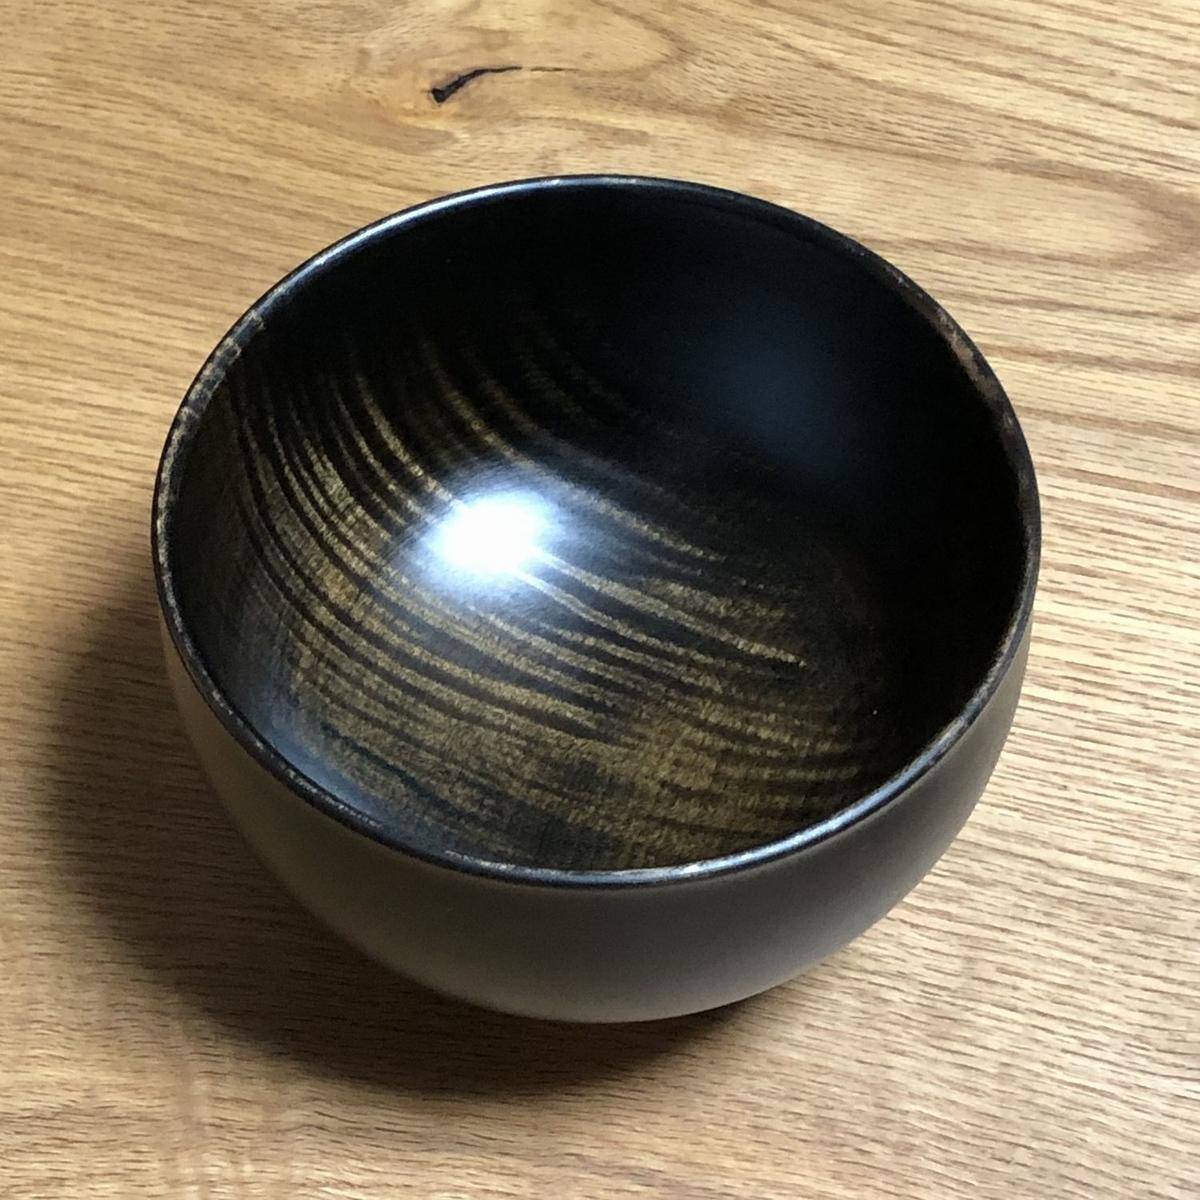 f:id:shiratsume:20191224115654j:plain